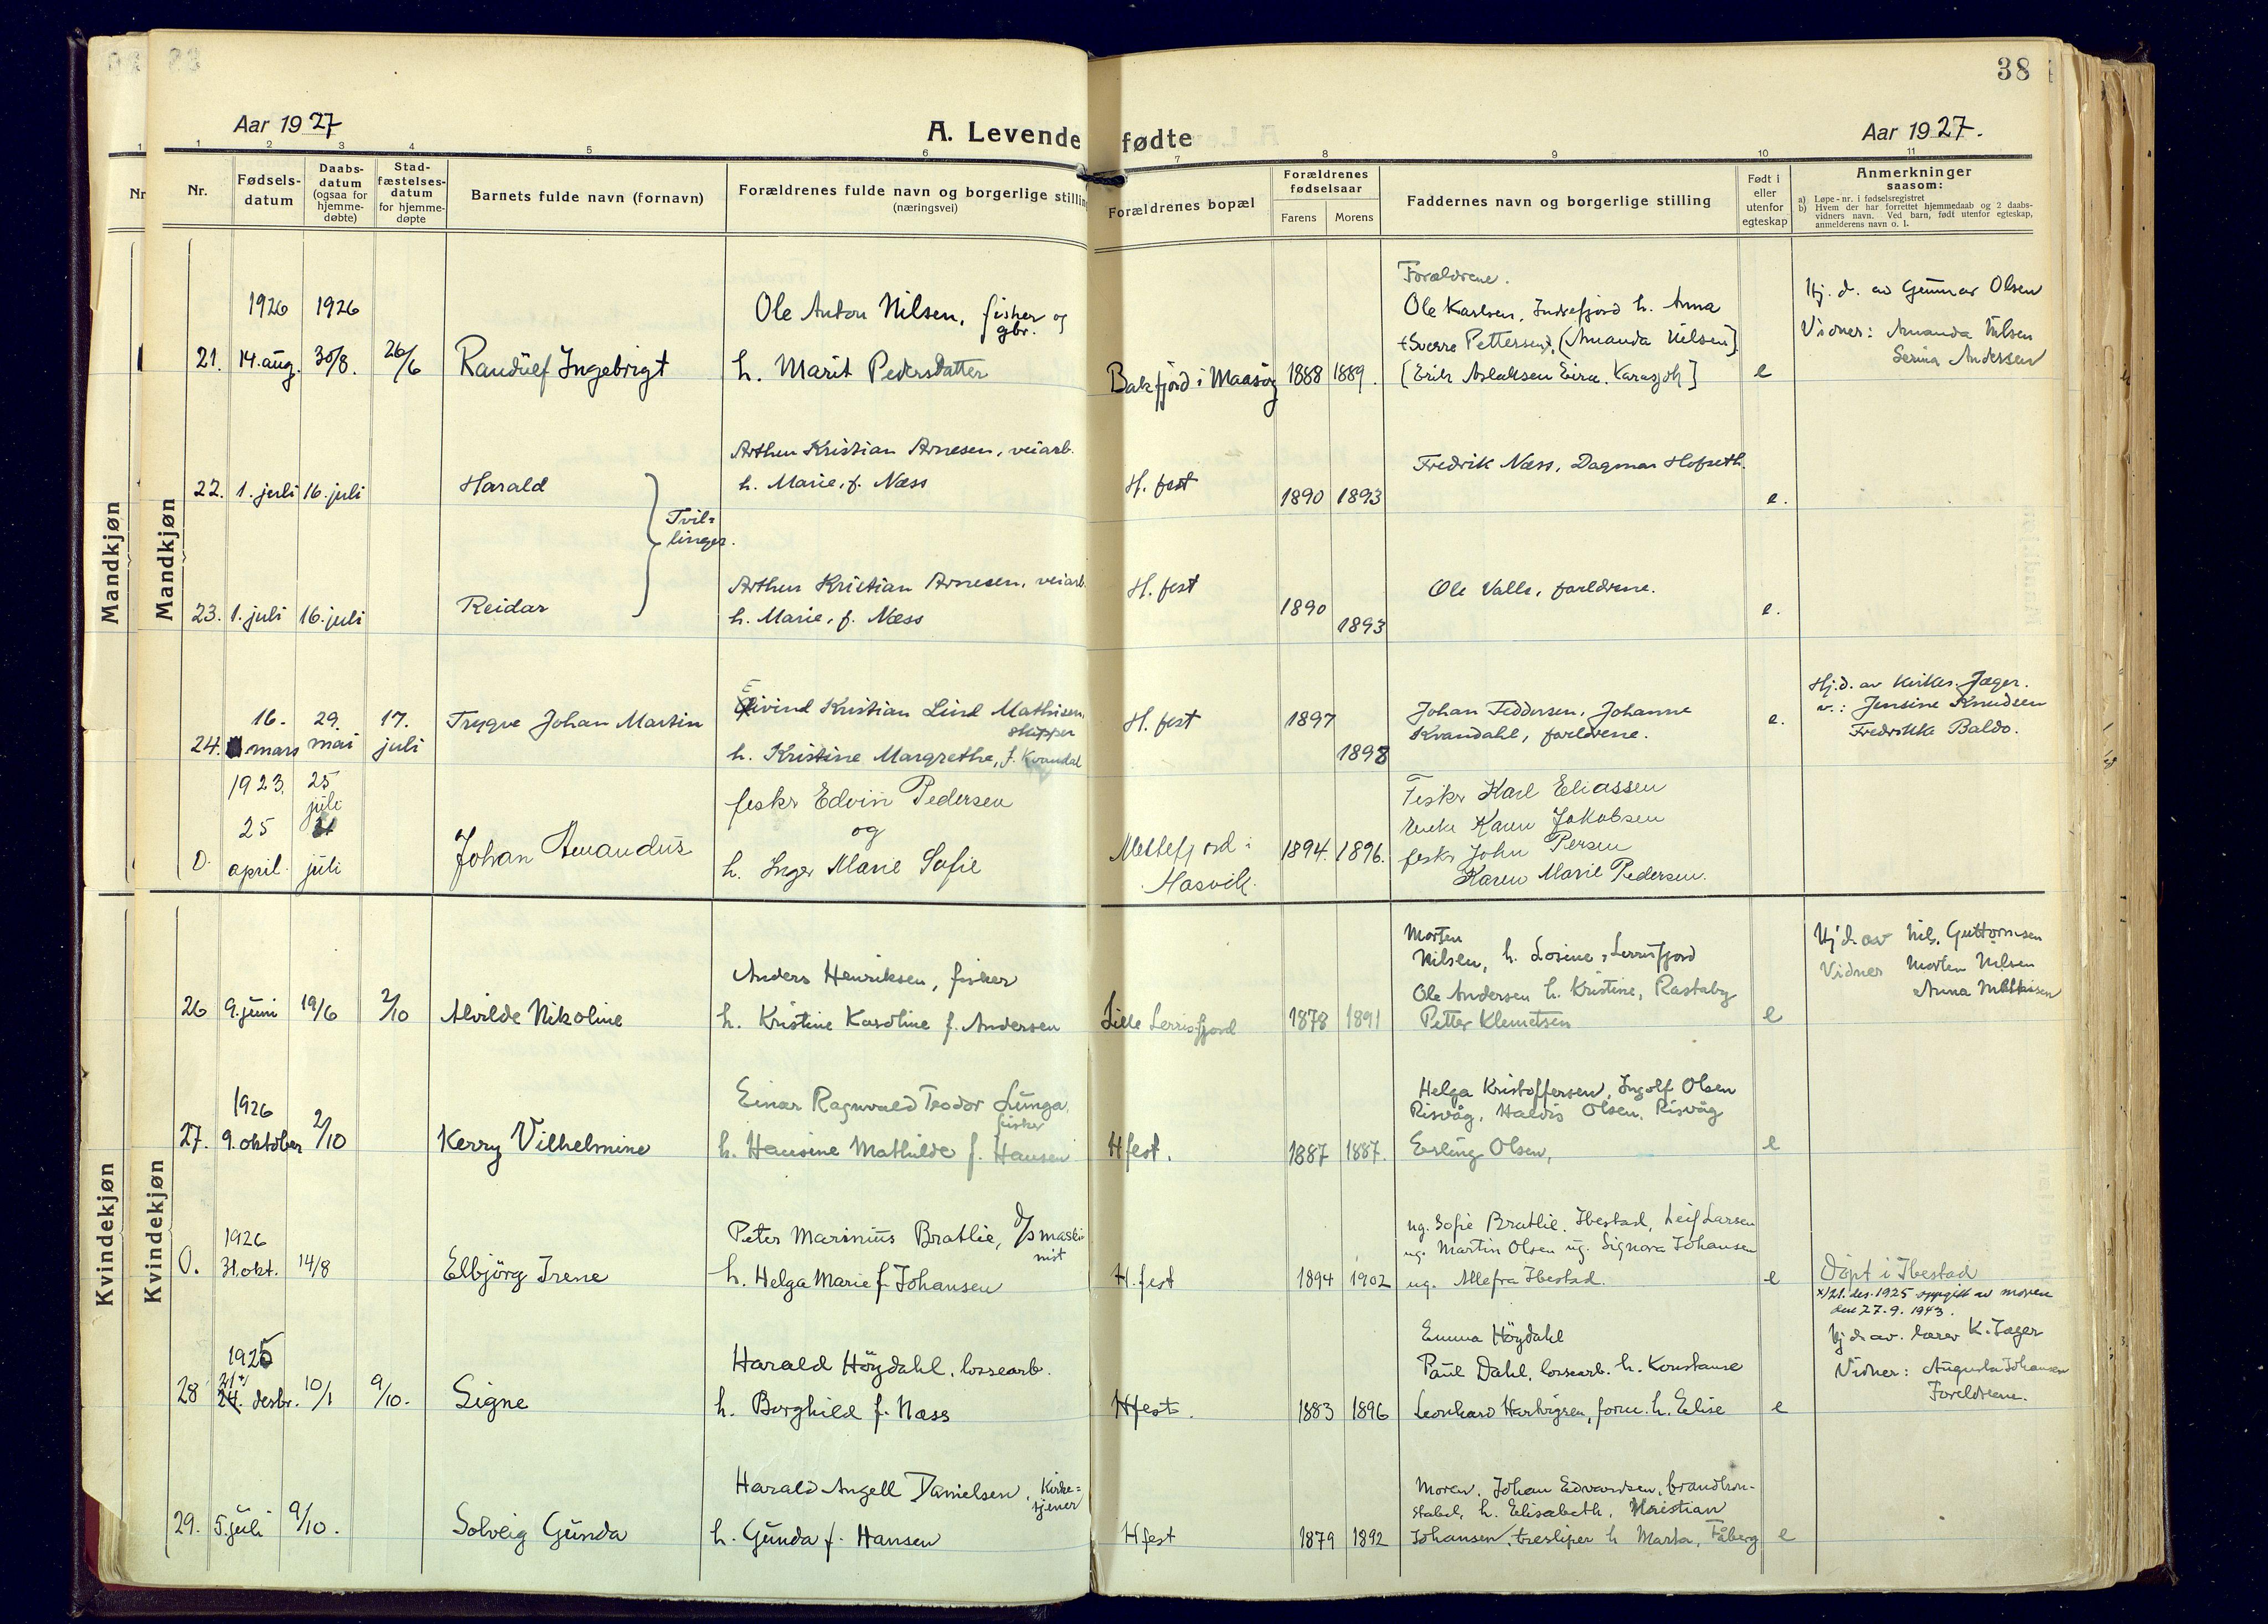 SATØ, Hammerfest sokneprestembete, Ministerialbok nr. 17, 1923-1933, s. 38